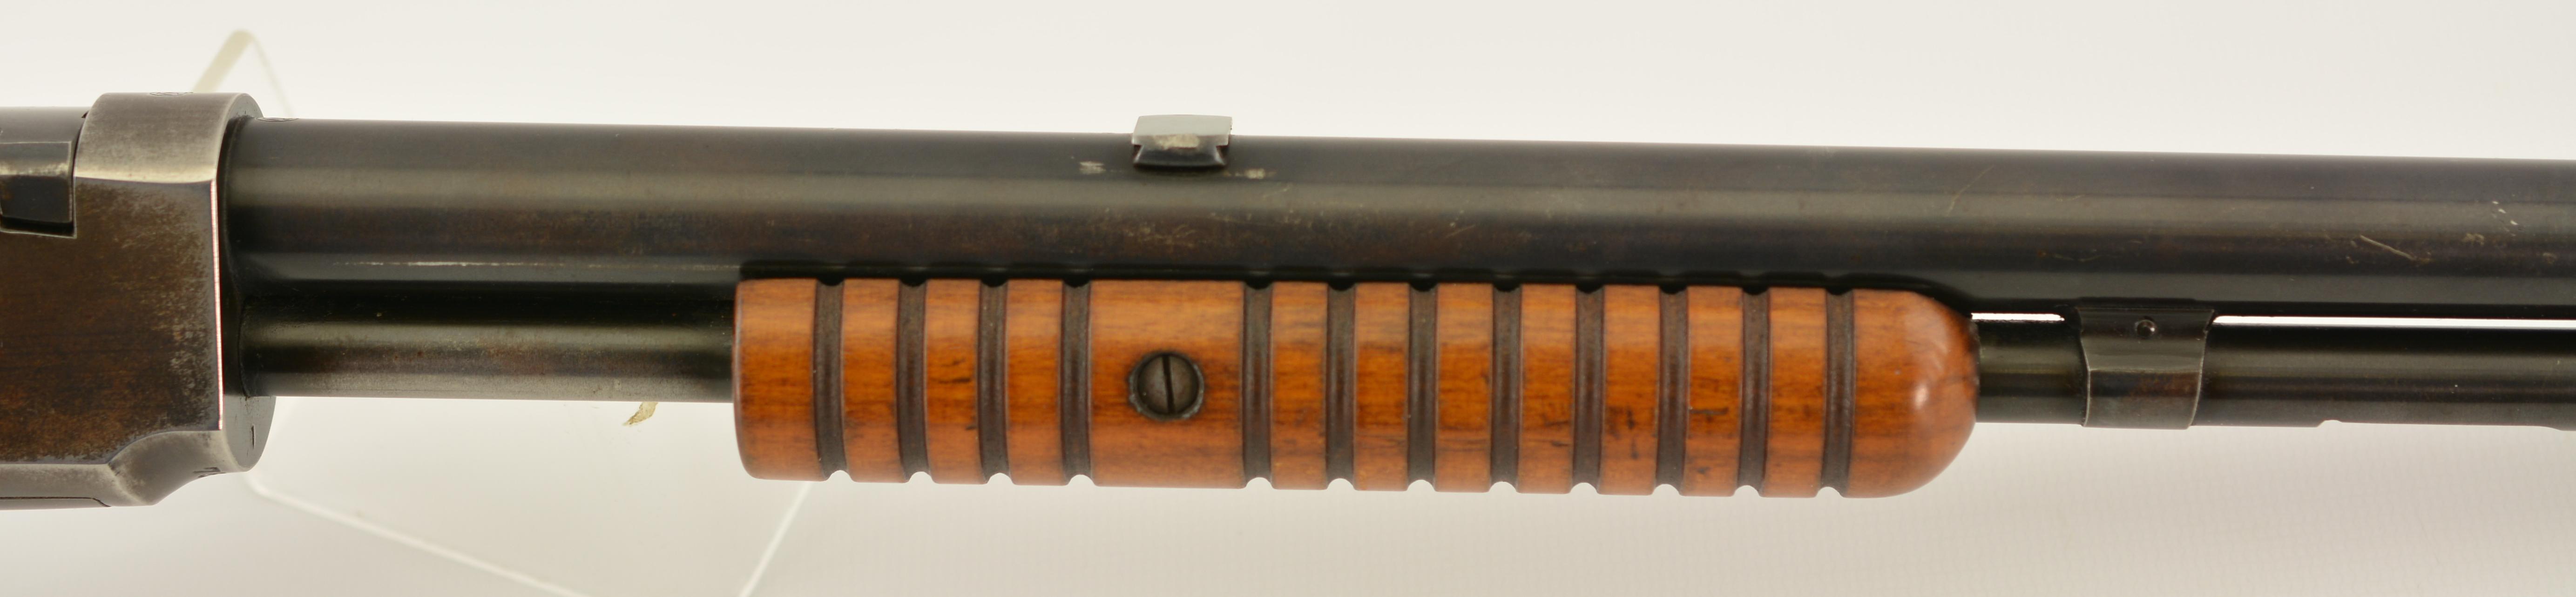 Winchester model 1906 takedown